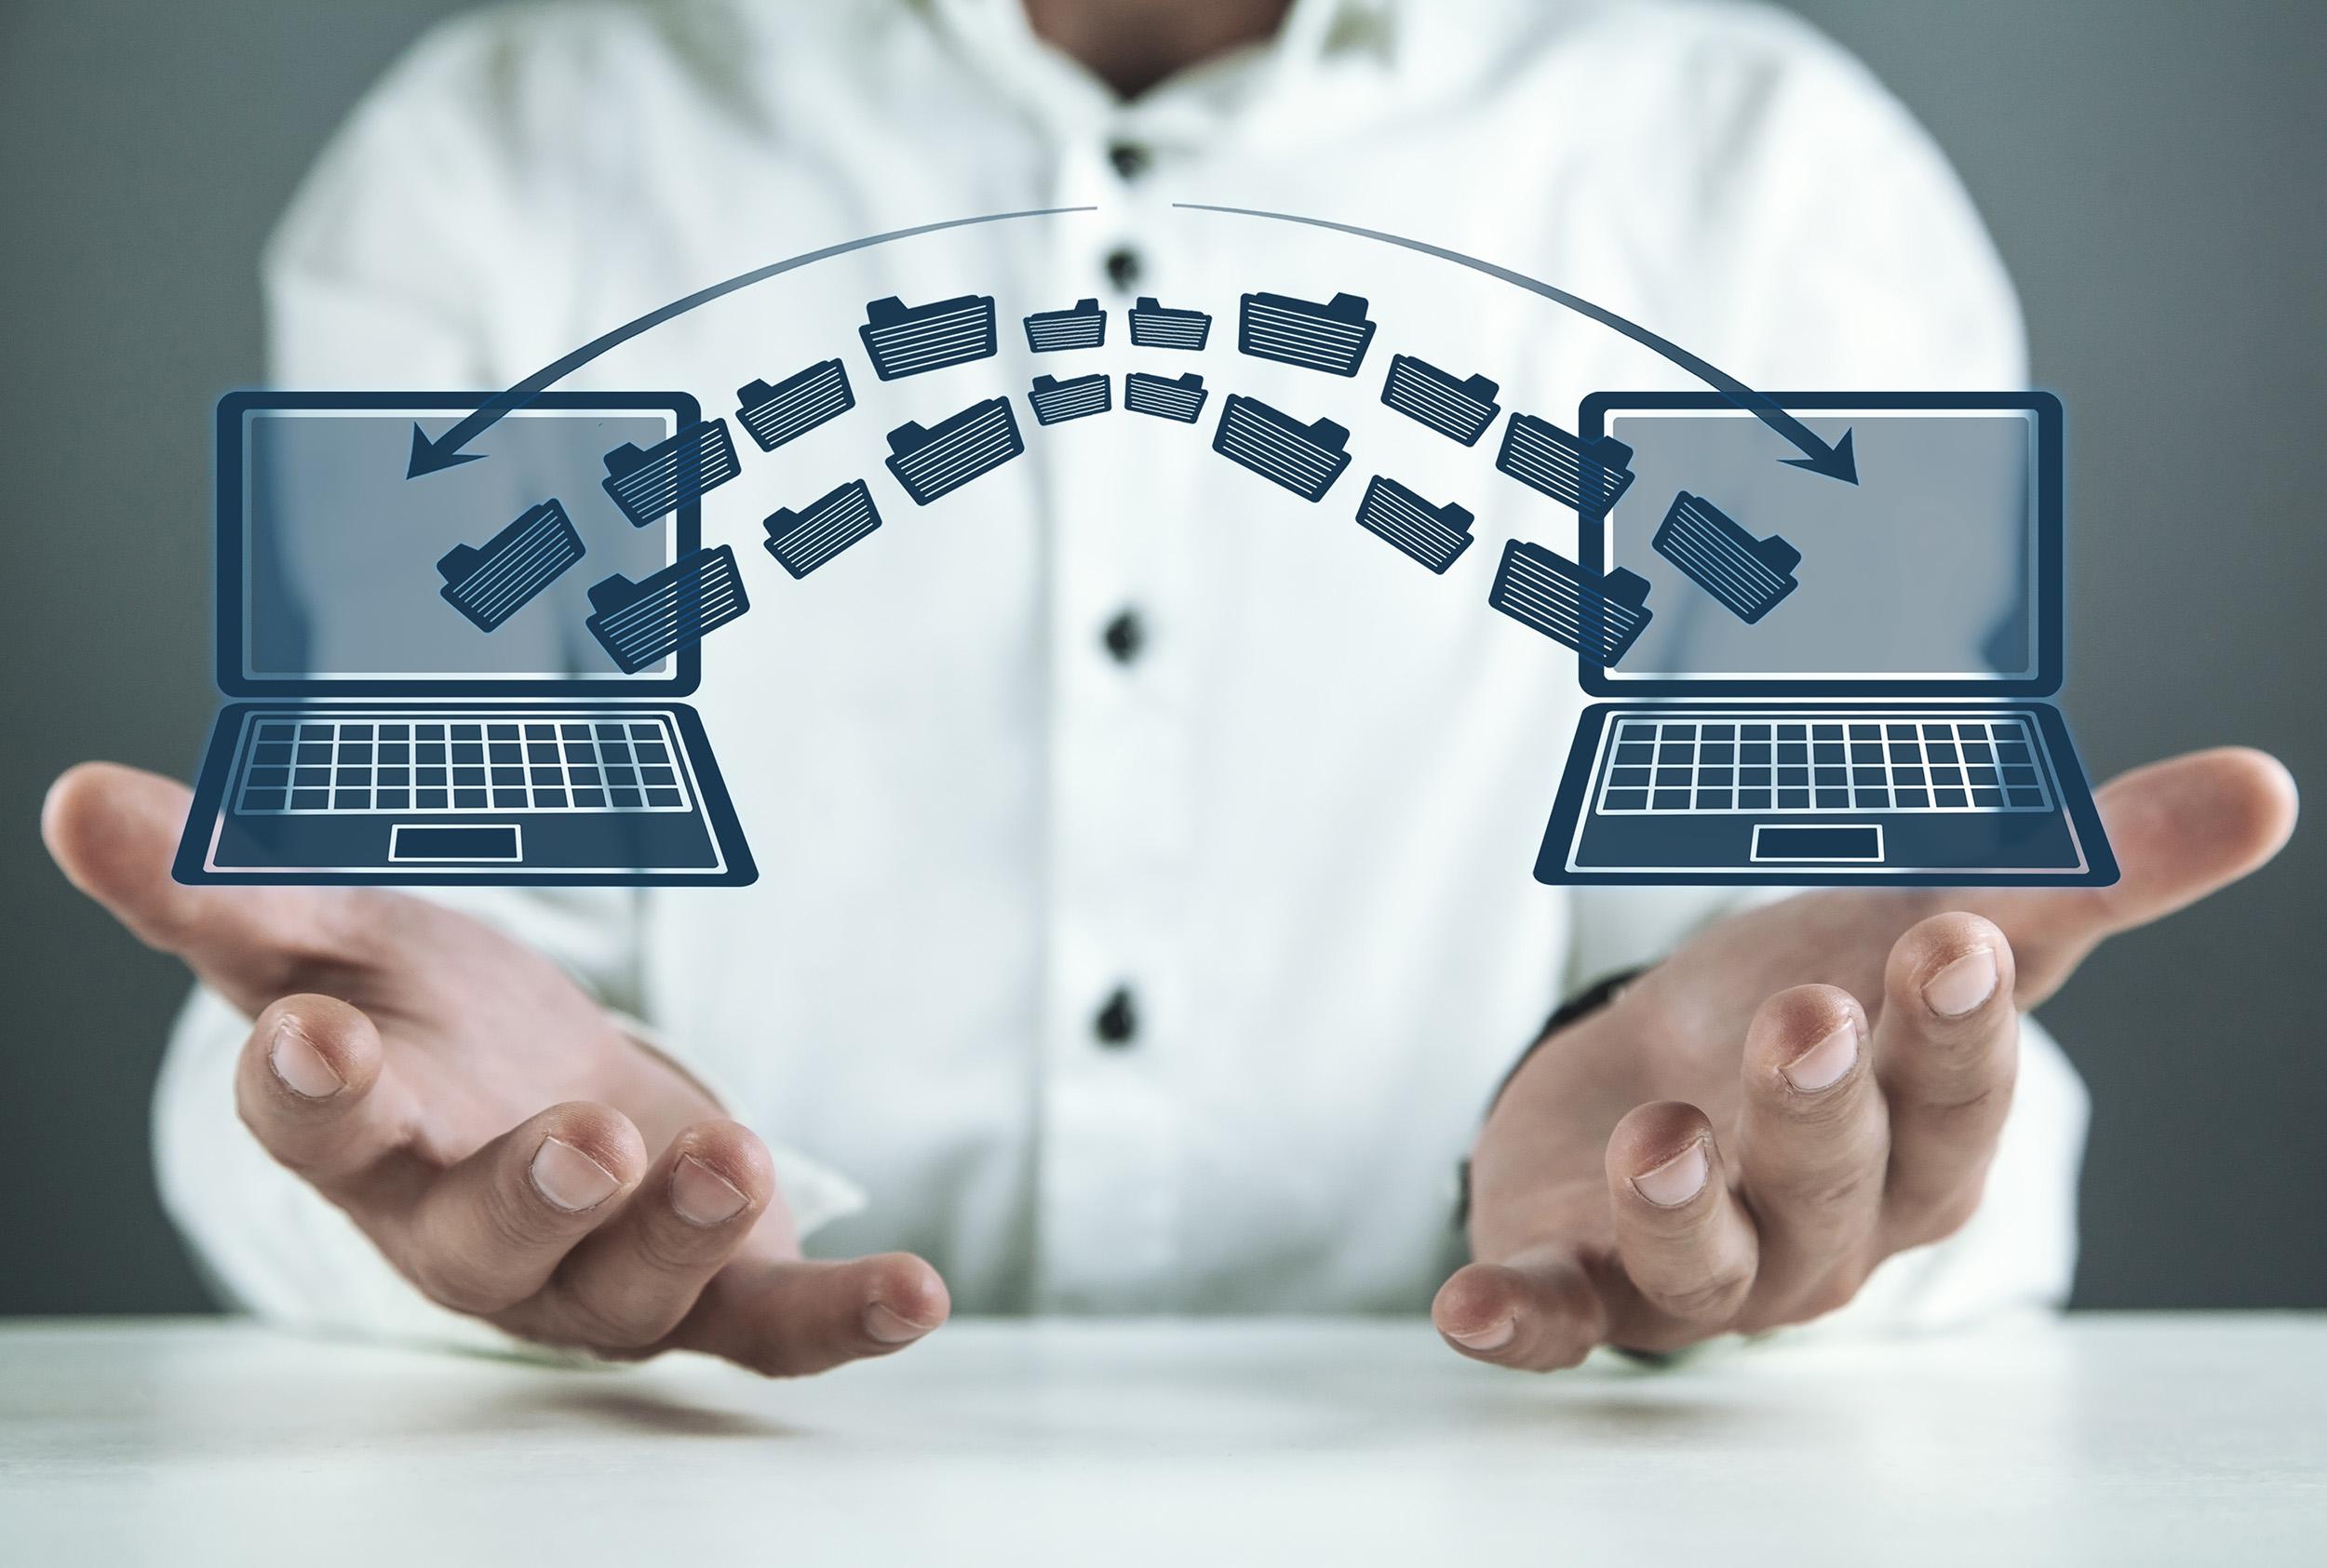 IT Services & Data Migration Services | ICM Document Solutions